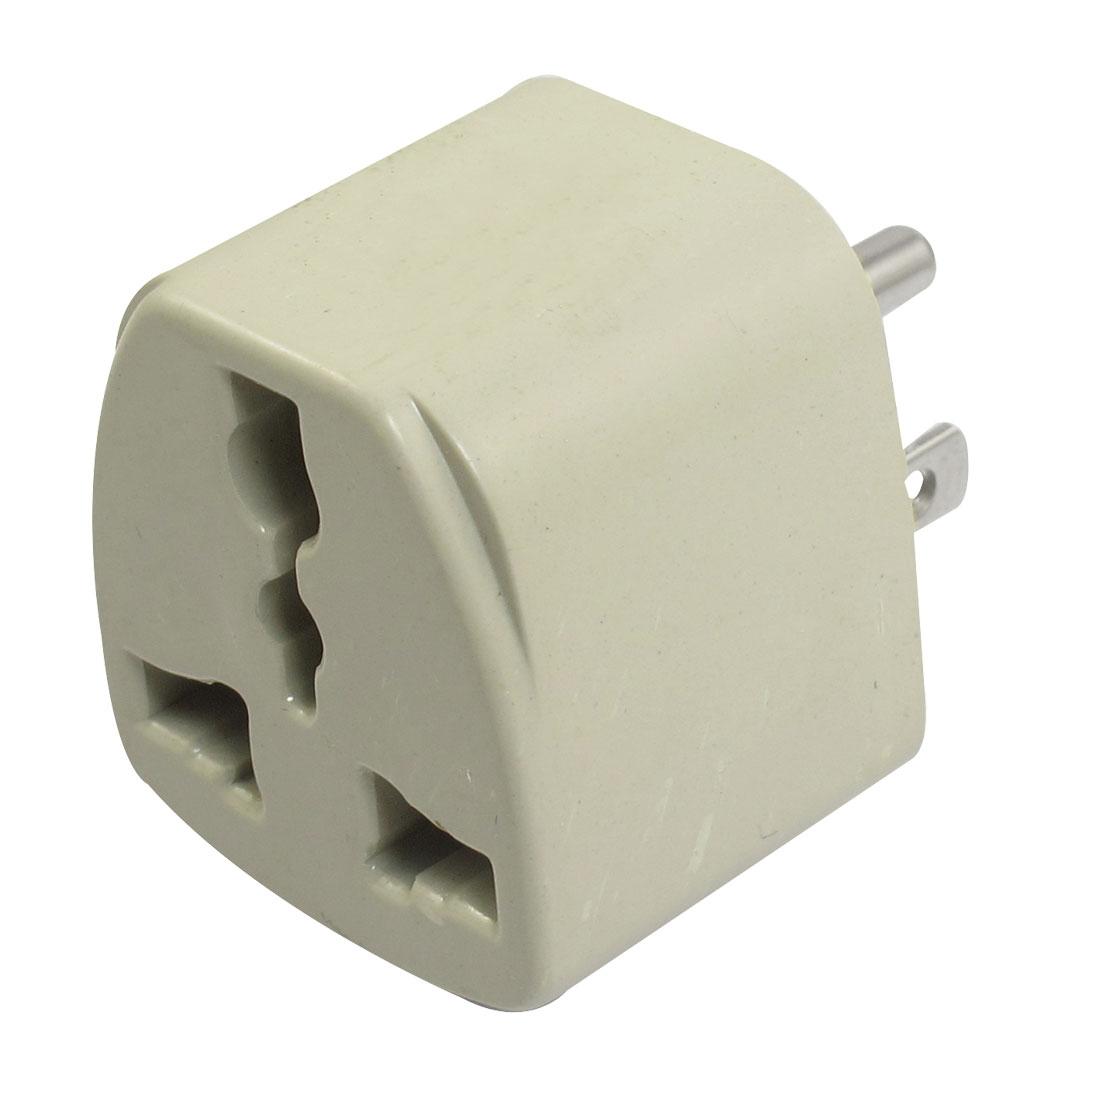 US UK Socket to US 3 Terminals Plug Travel Adapter Converter AC 250V 10A